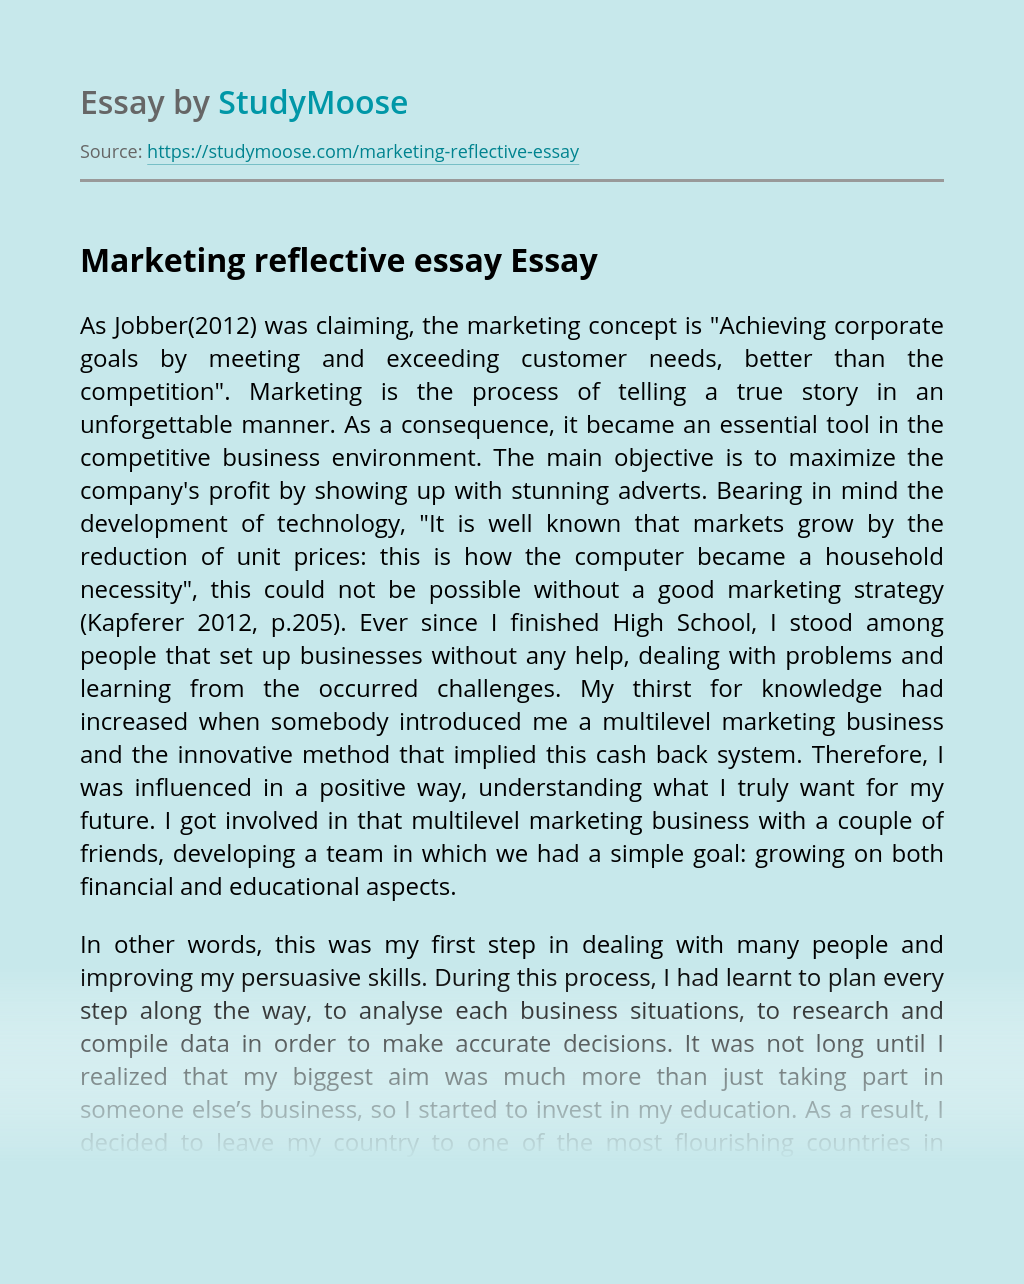 Marketing reflective essay